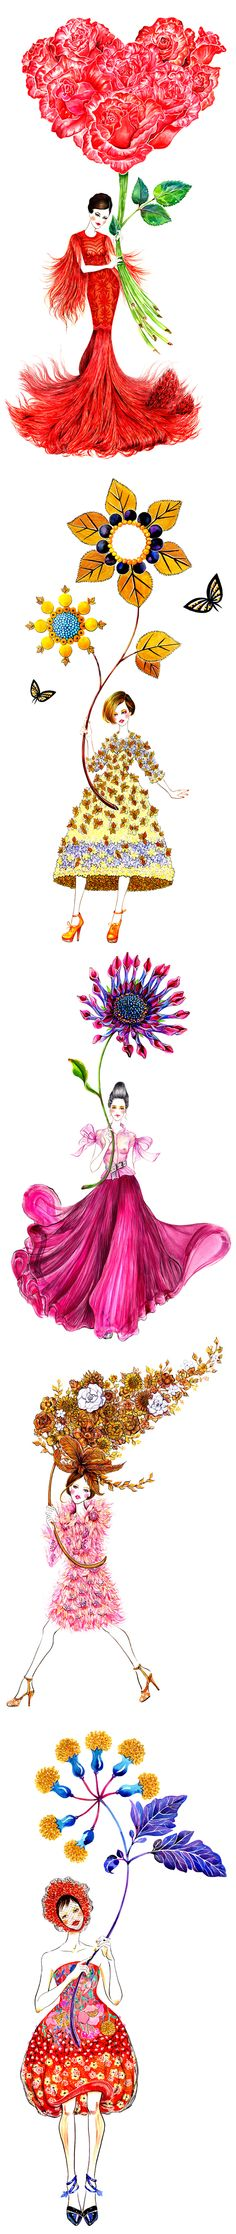 Flower Mood | Fashion Illustration Series by Sunny Gu #fashion #illustration #fashionillustration